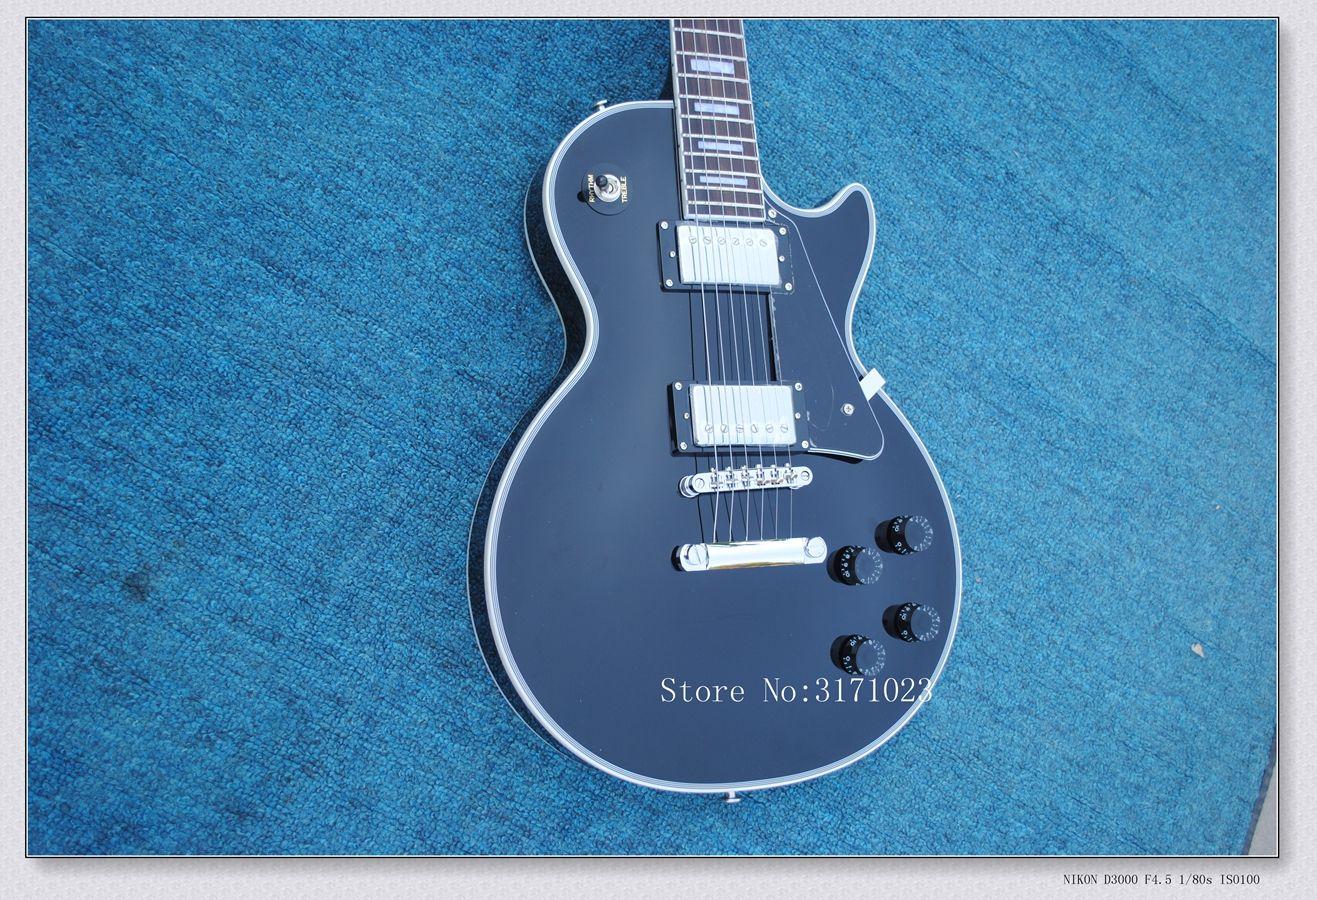 Black Beauty electric guitar Custom shop Black beauty Electric Guitar 2 pickup wholesale guitars from china